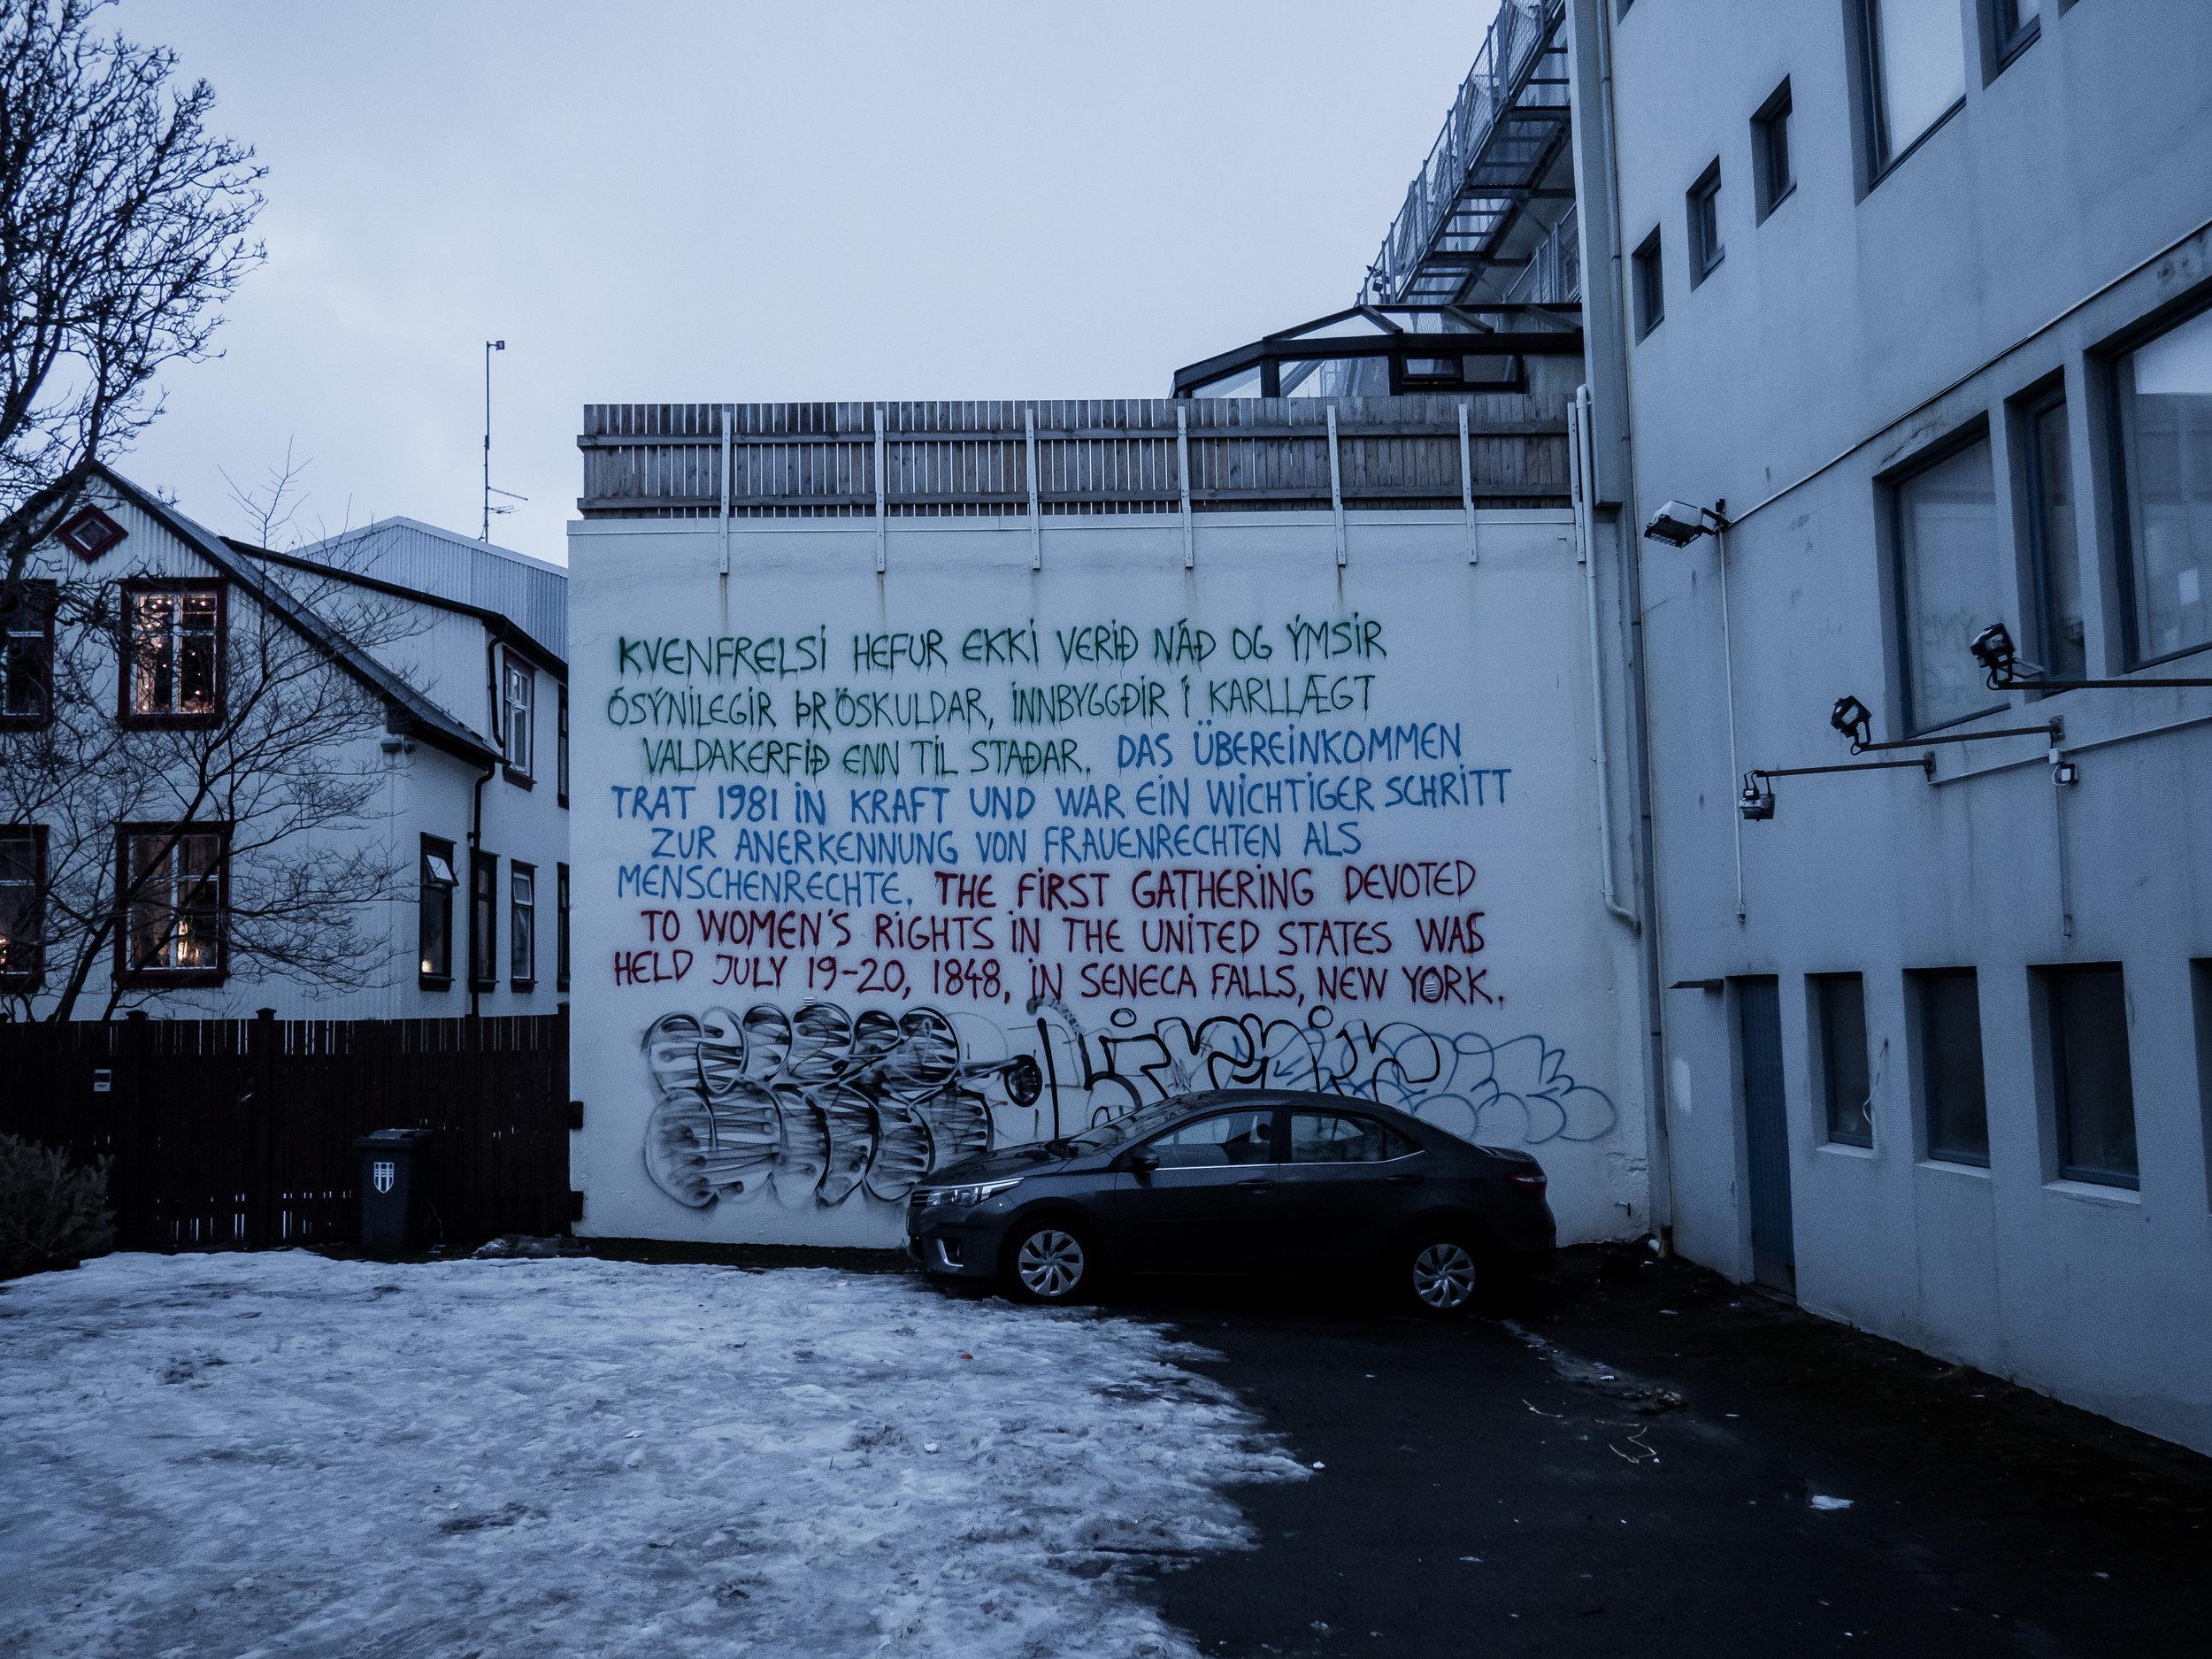 Reykjavik-16.jpg